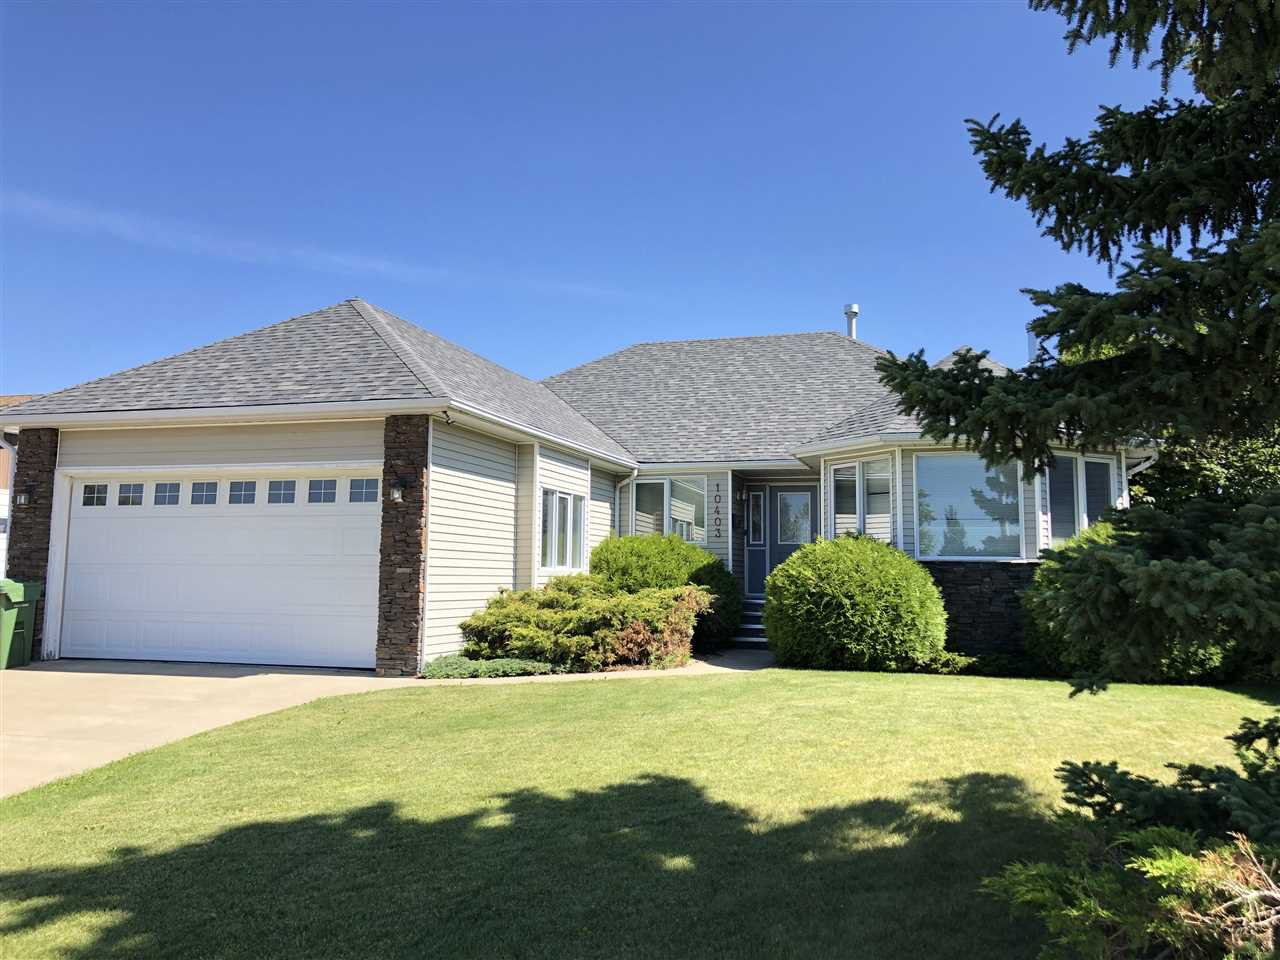 Main Photo: 10403 111 Avenue: Westlock House for sale : MLS®# E4186992